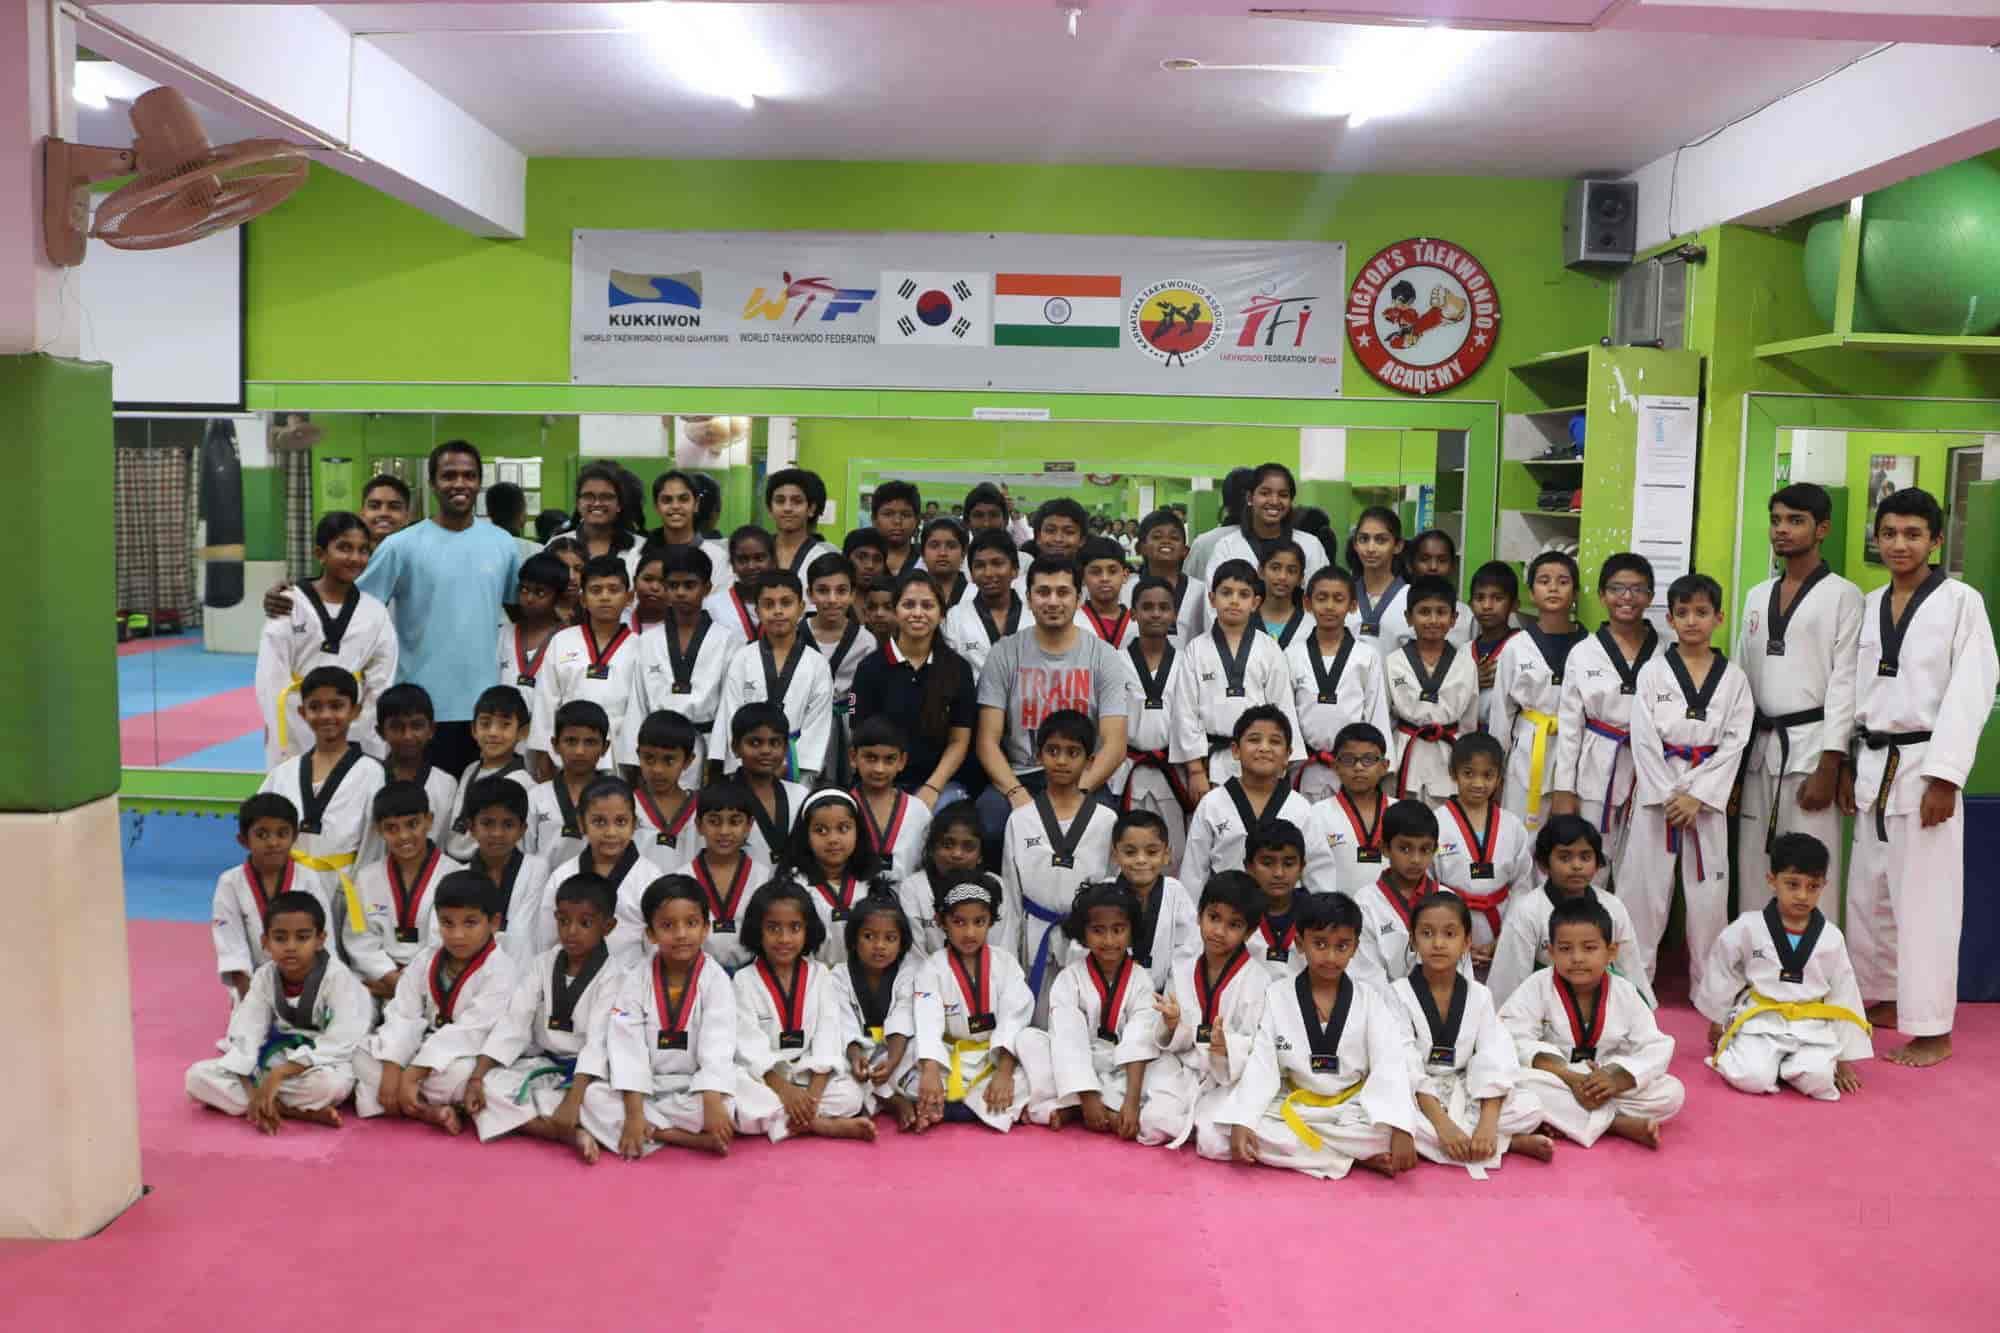 Victors Taekwondo Martial Arts Academy & Fitness Center, Horamavu